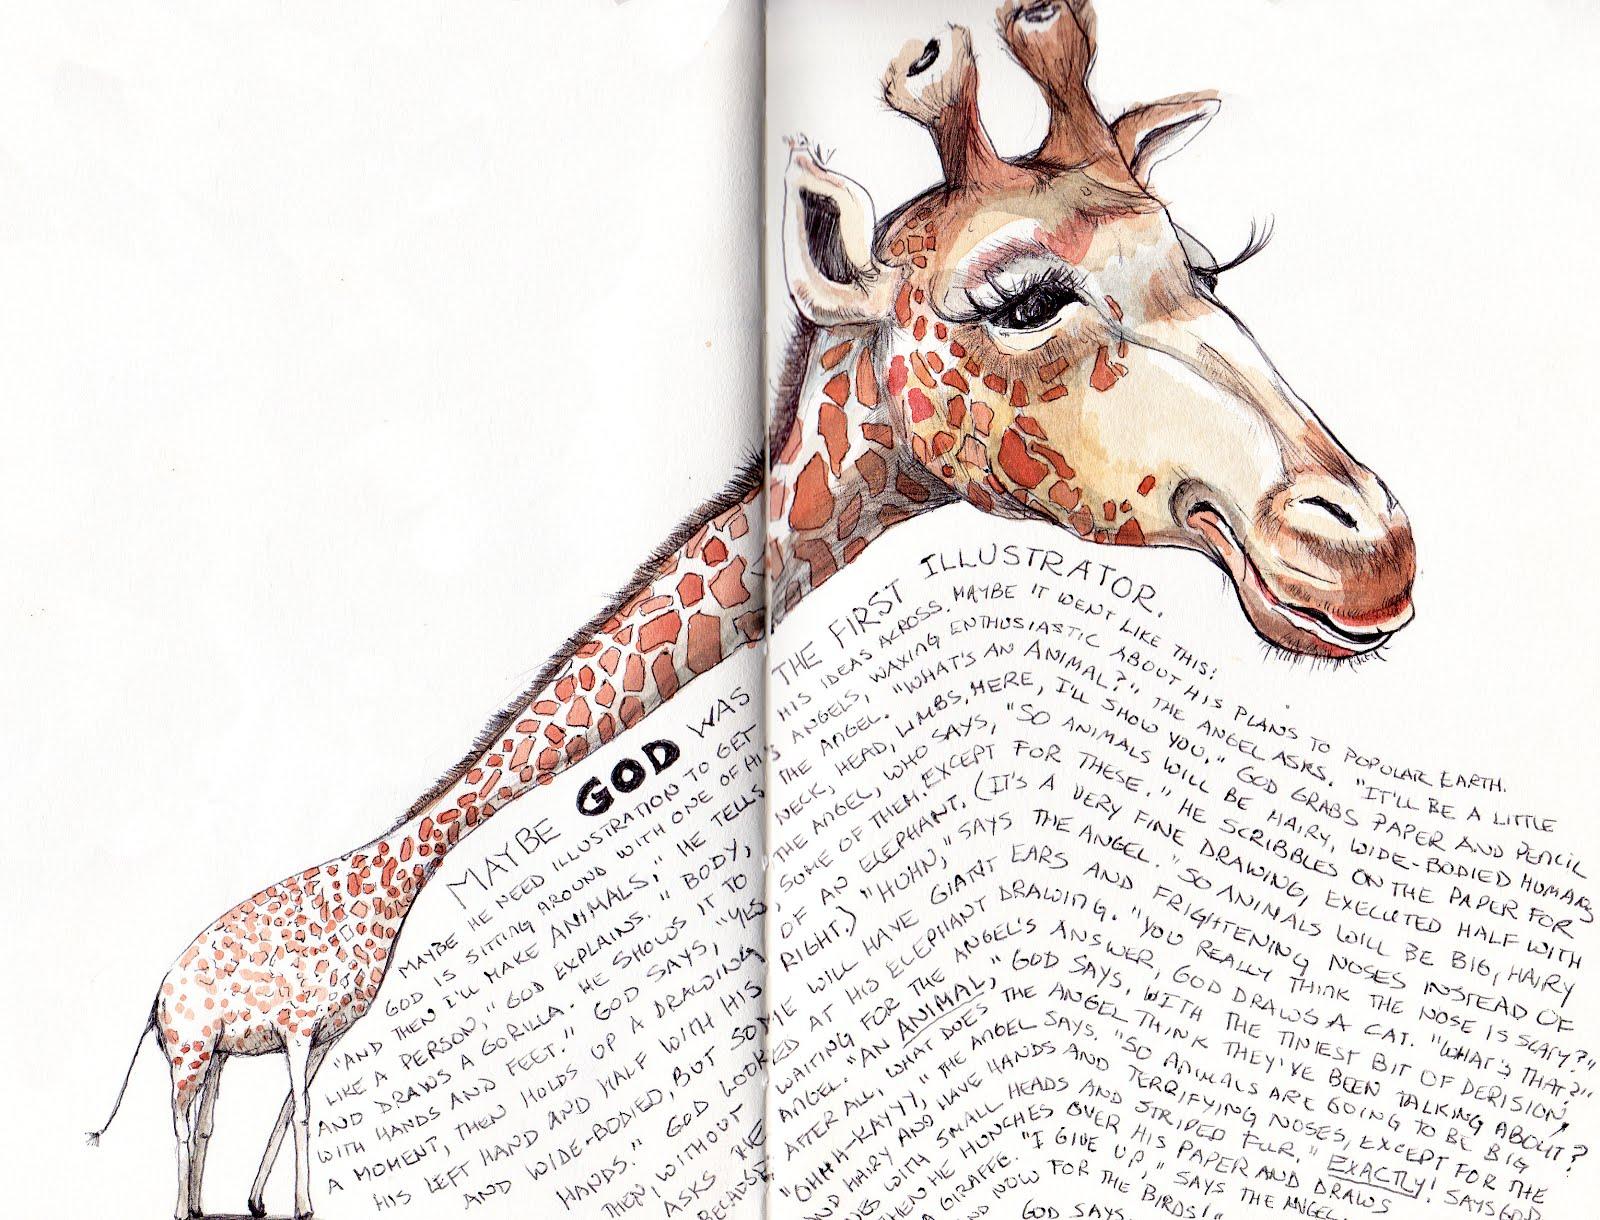 Giraffe Face Pencil Drawing - photo#26